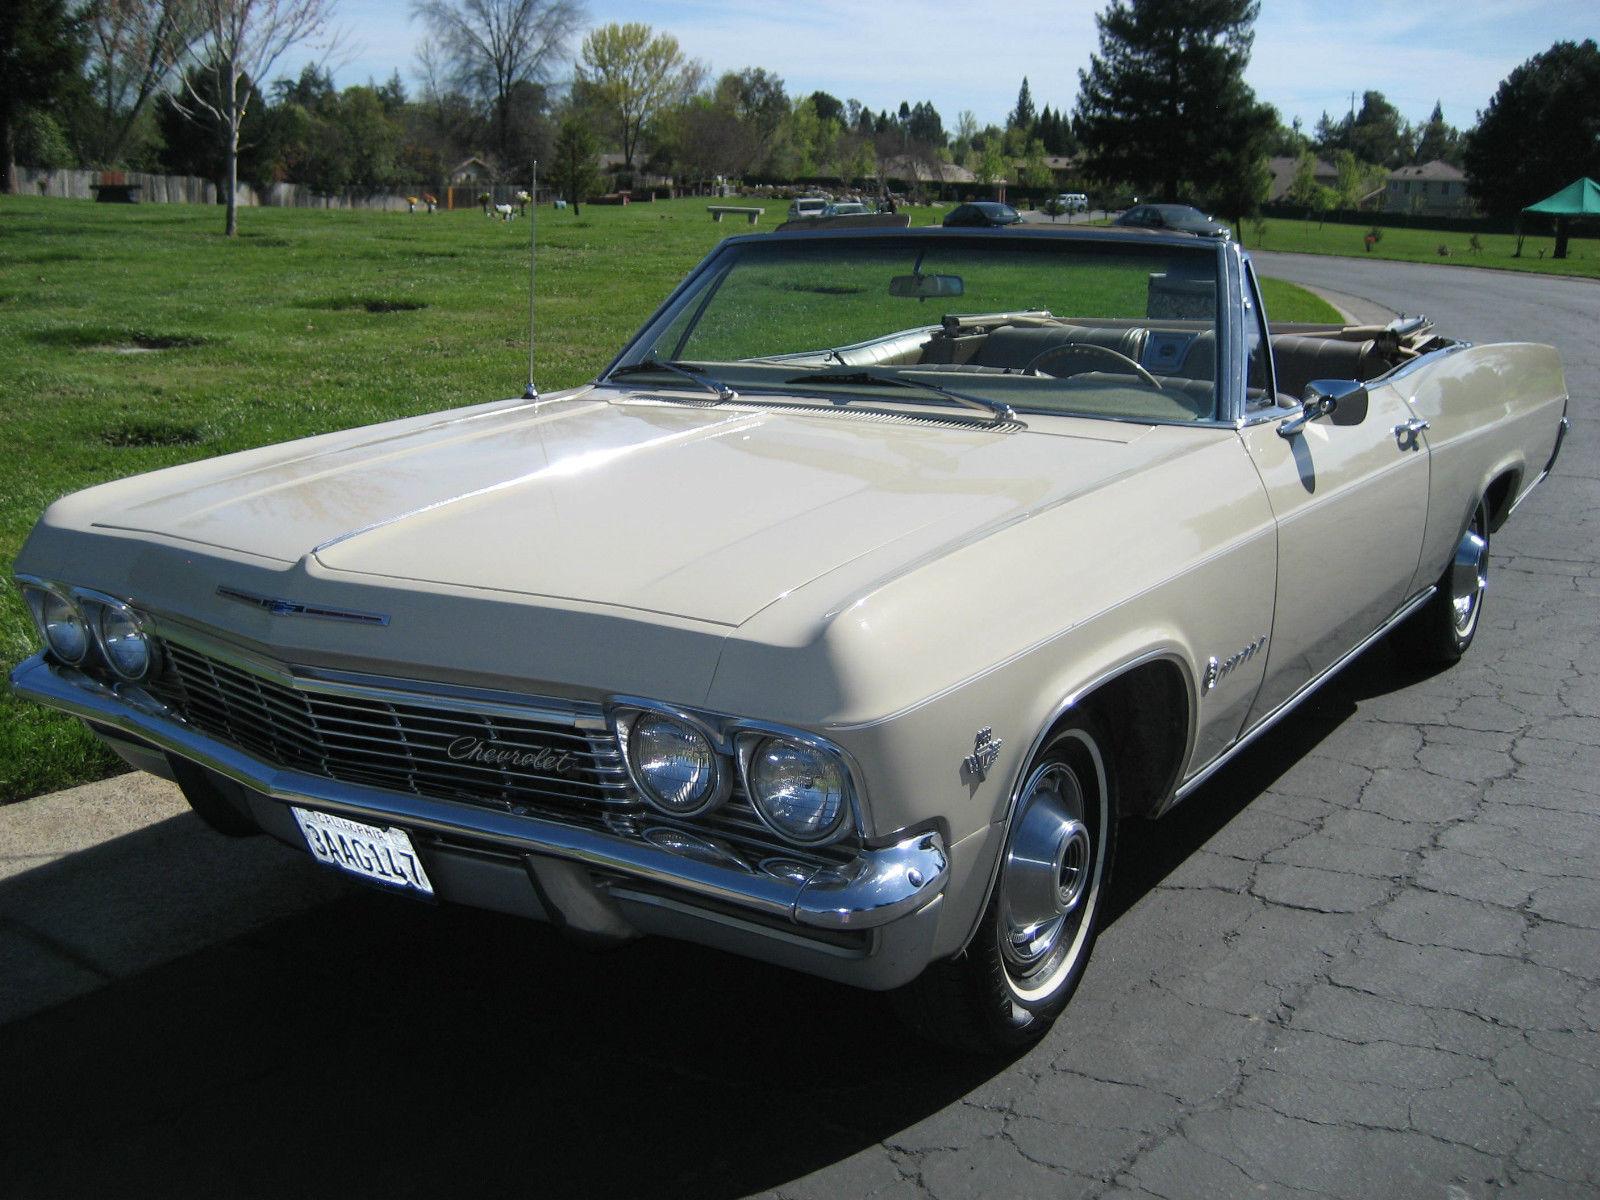 1965 chevrolet impala convertible for sale photos technical. Black Bedroom Furniture Sets. Home Design Ideas